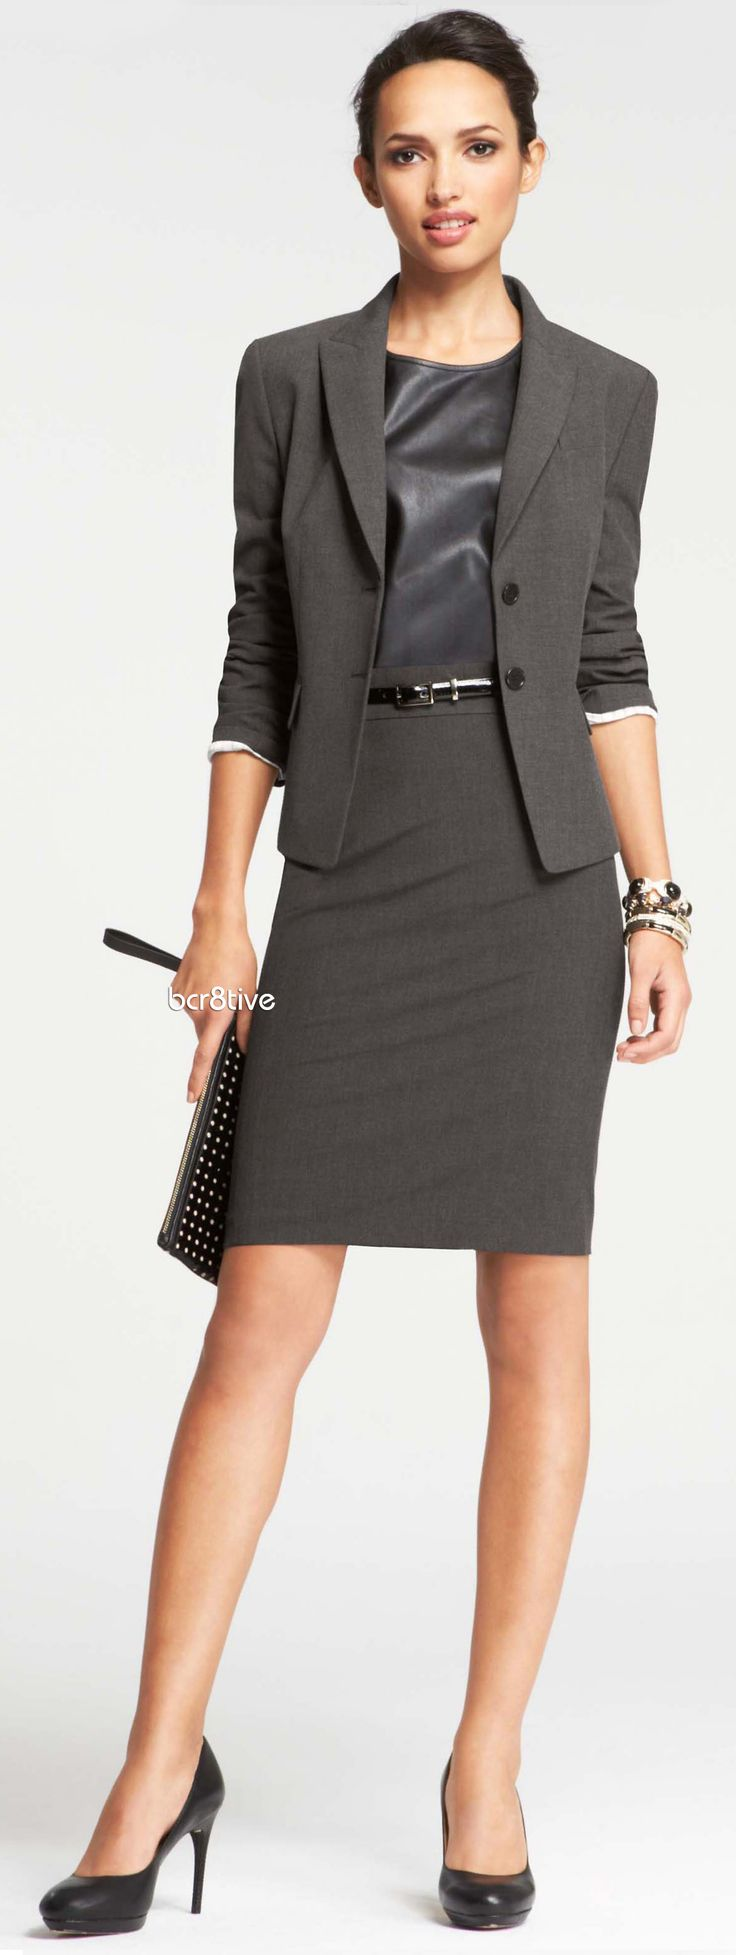 Ann Taylor Two Button Jacket & All-Season Stretch Pencil Skirt